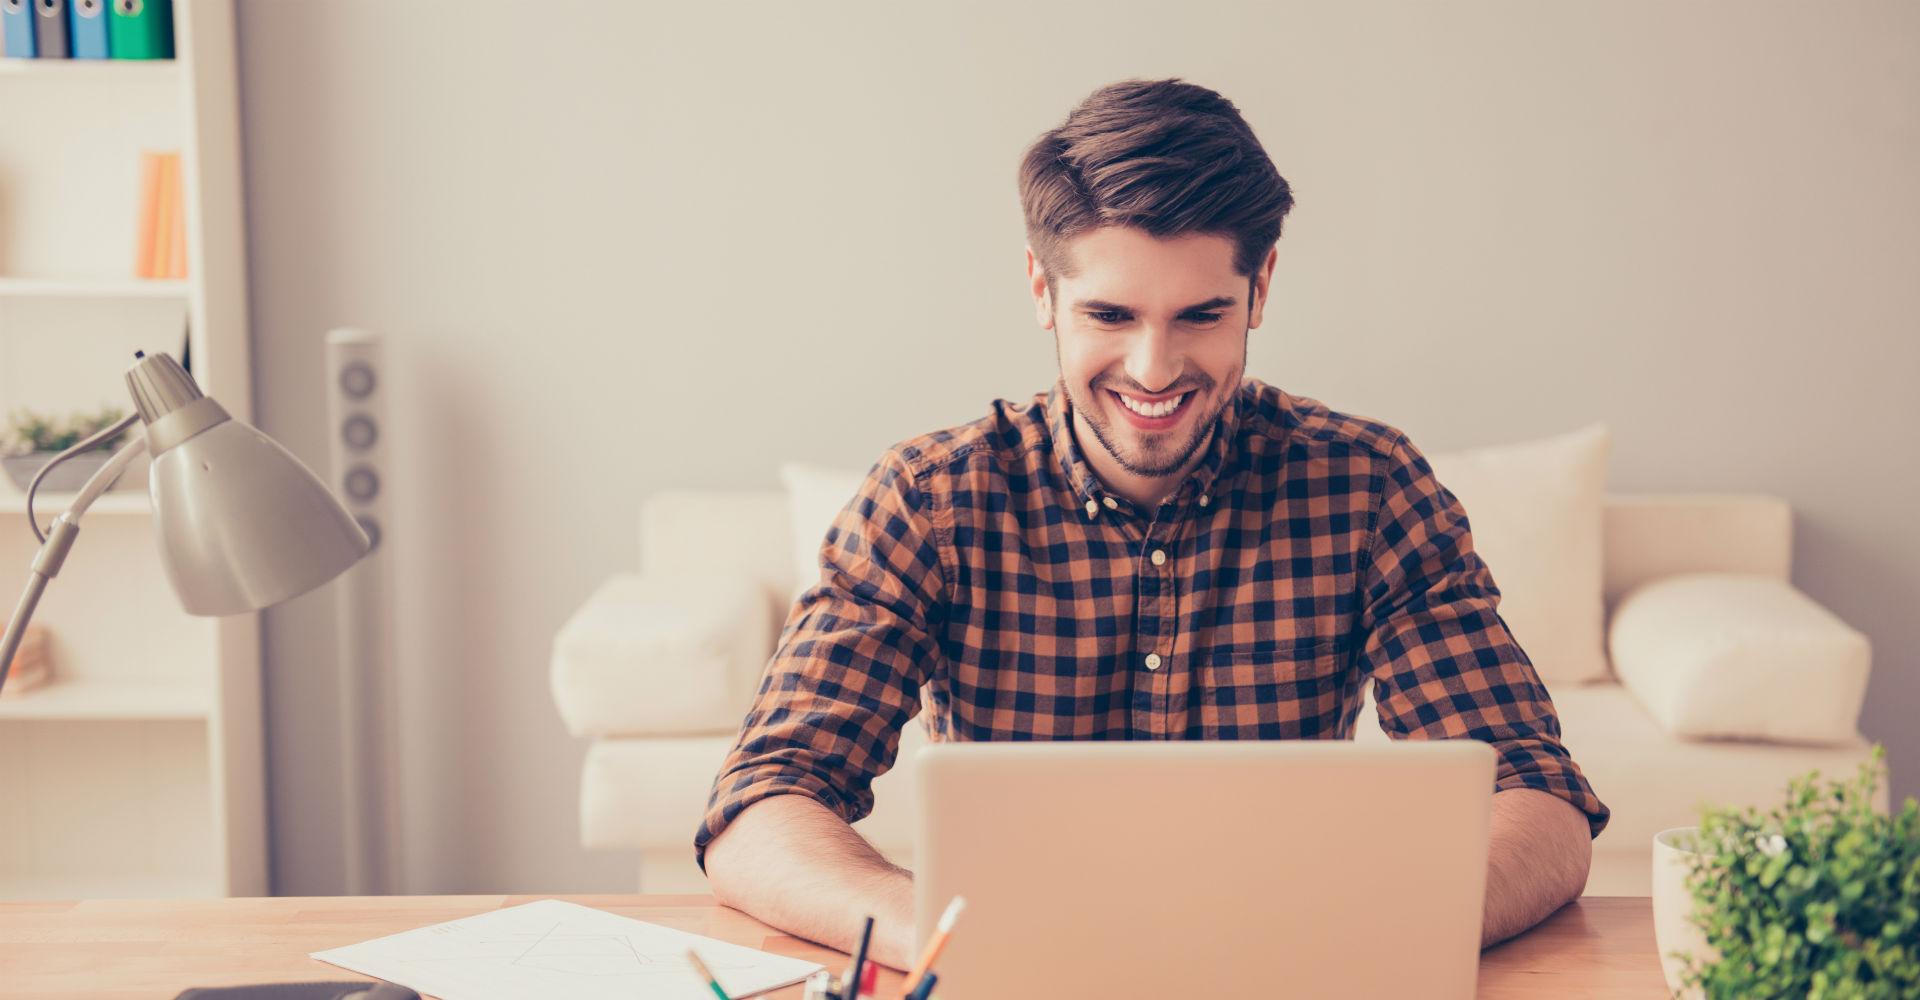 Junger Mann surft am Laptop mit Google Chrome im Netz.